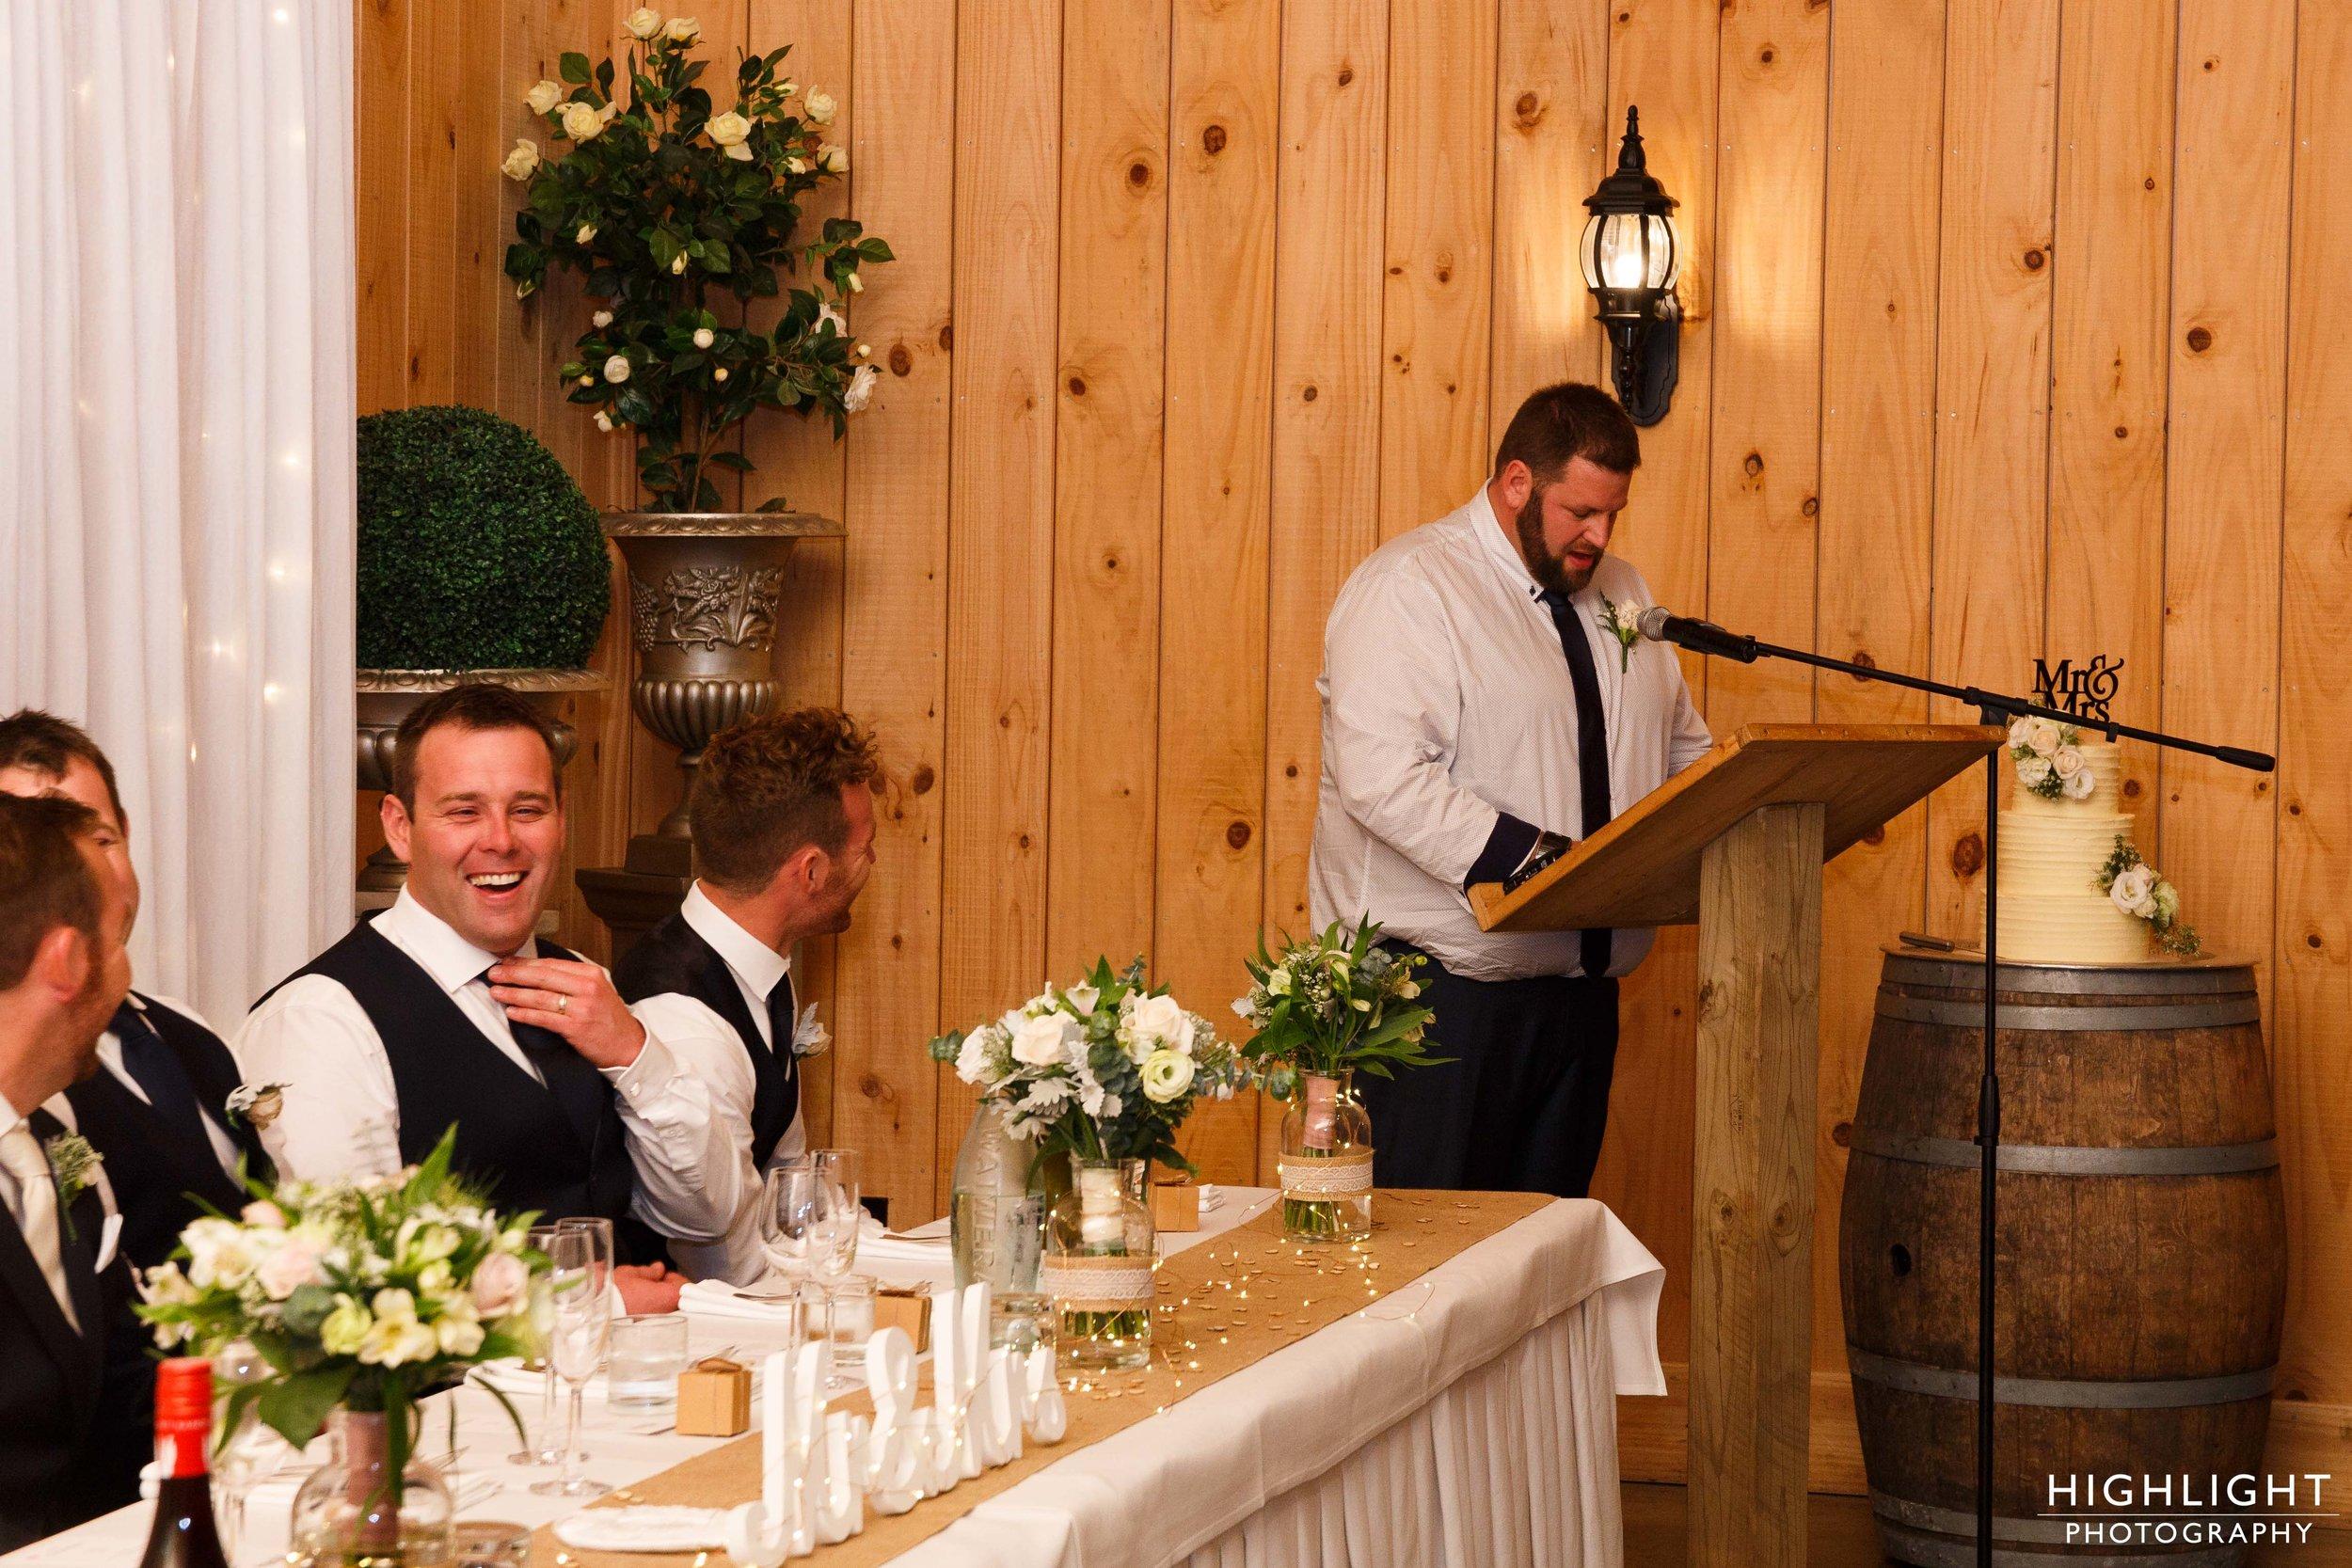 highlight-wedding-photography-palmerston-north-new-zealand-orlando-country-club-wedding-122.jpg